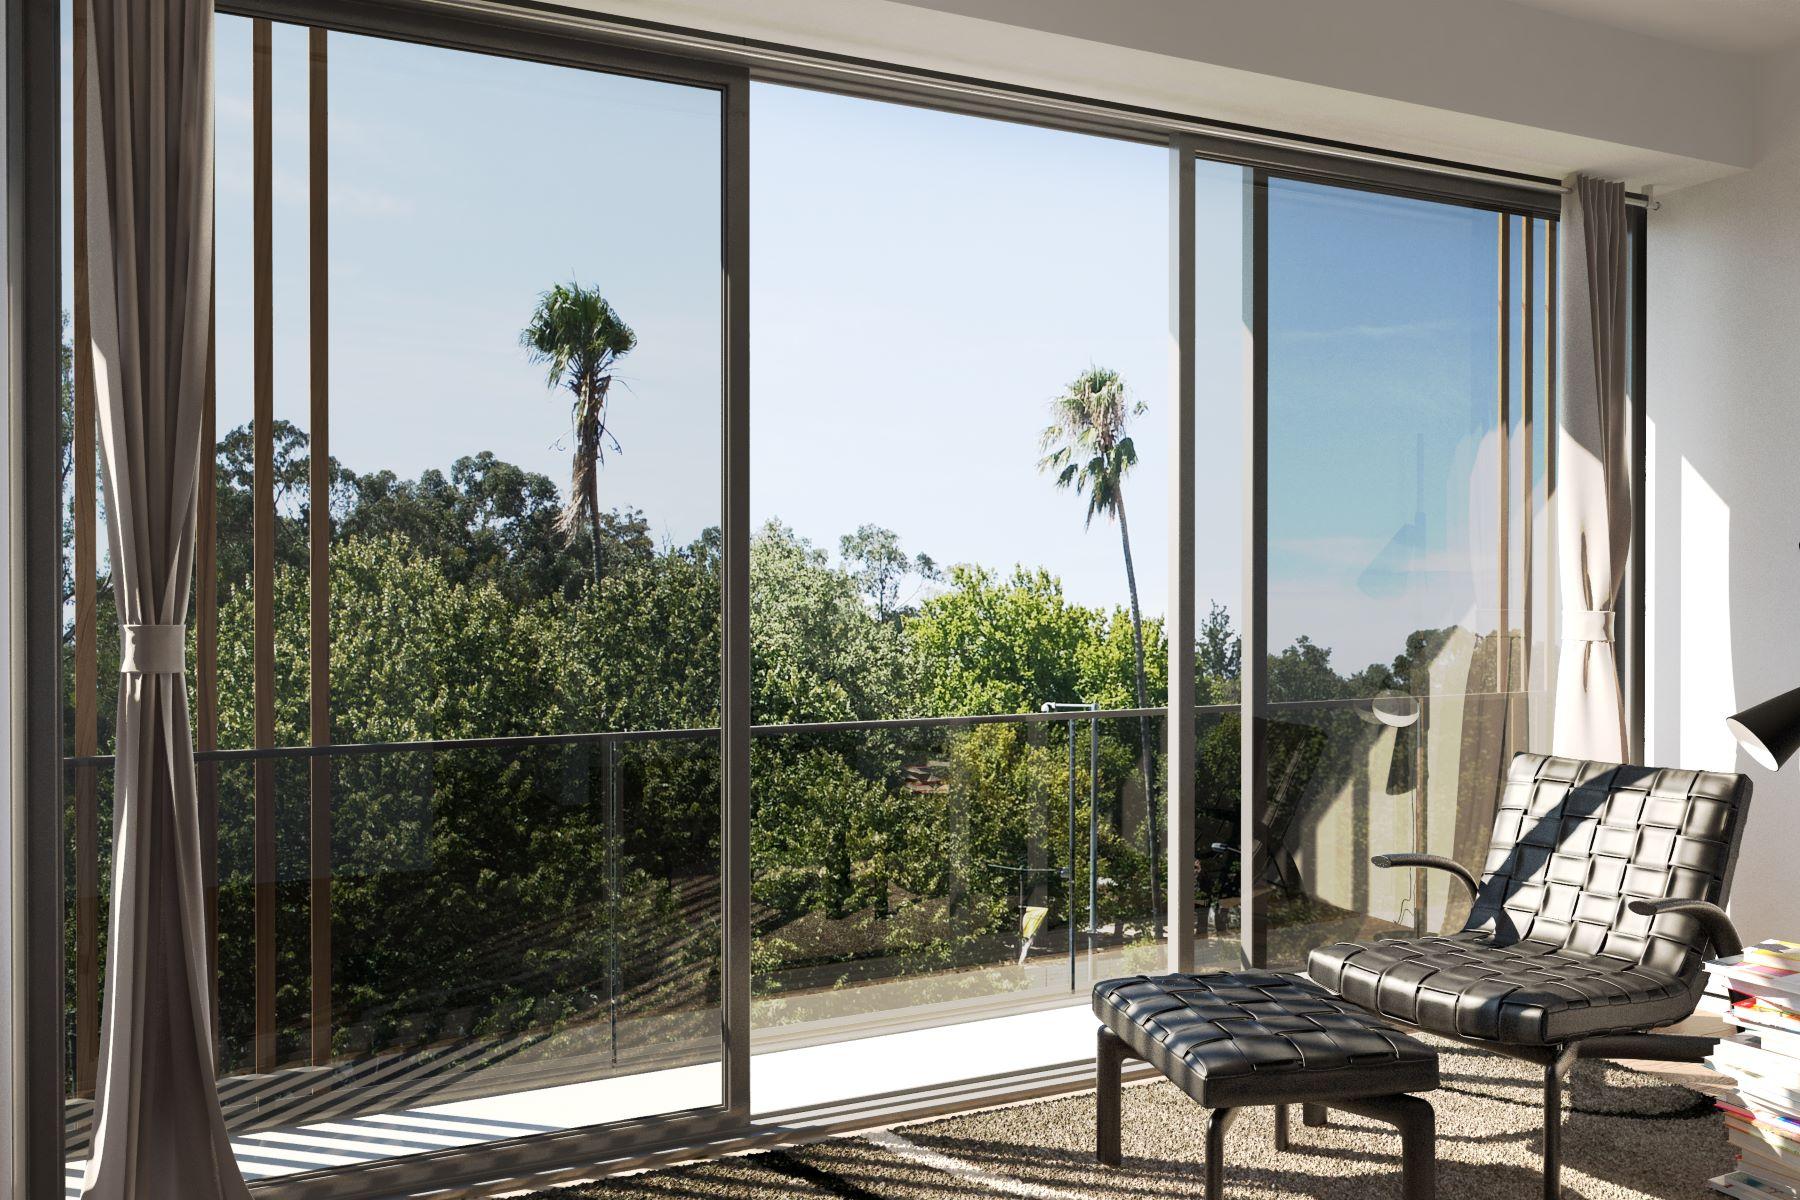 Apartment for Sale at Flat, 3 bedrooms, for Sale Lisboa, Lisboa, Portugal